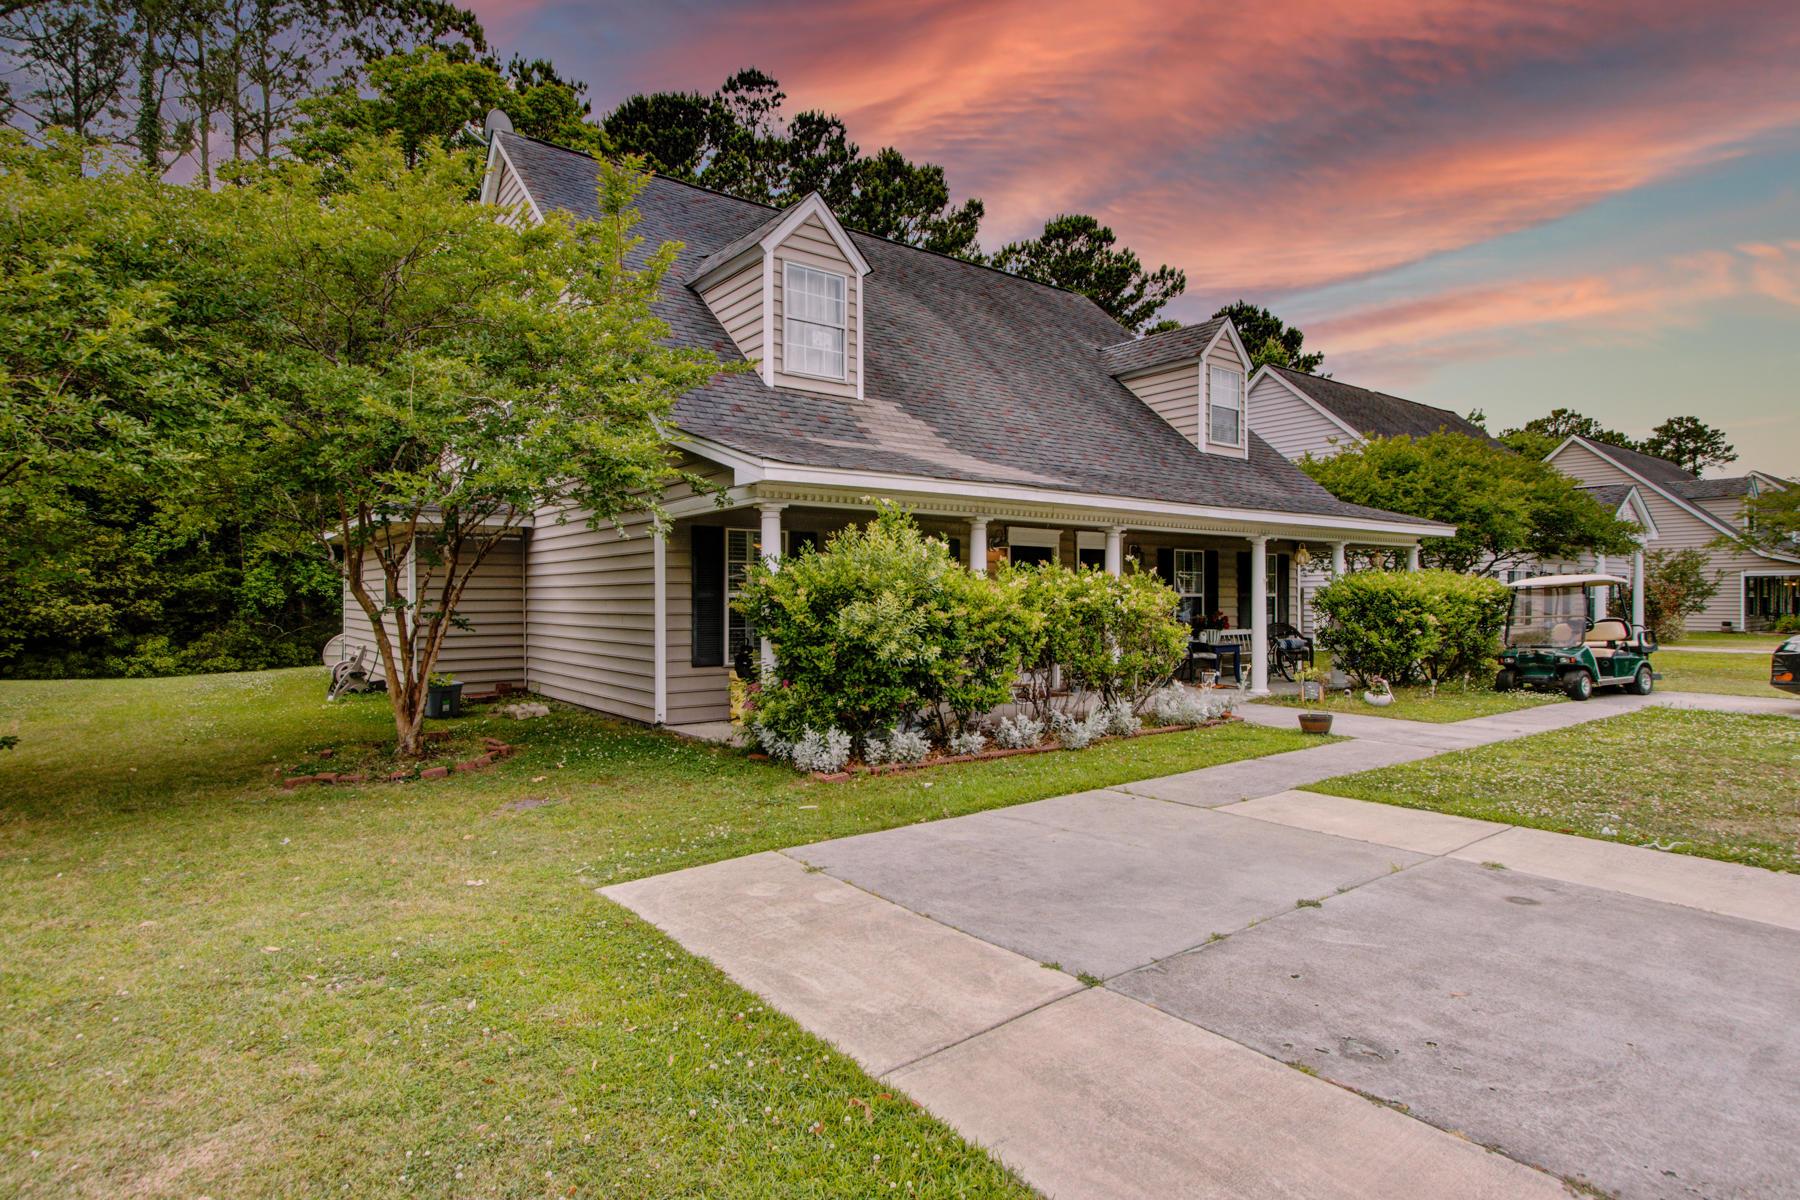 Dunes West Homes For Sale - 2232 Kings Gate, Mount Pleasant, SC - 1